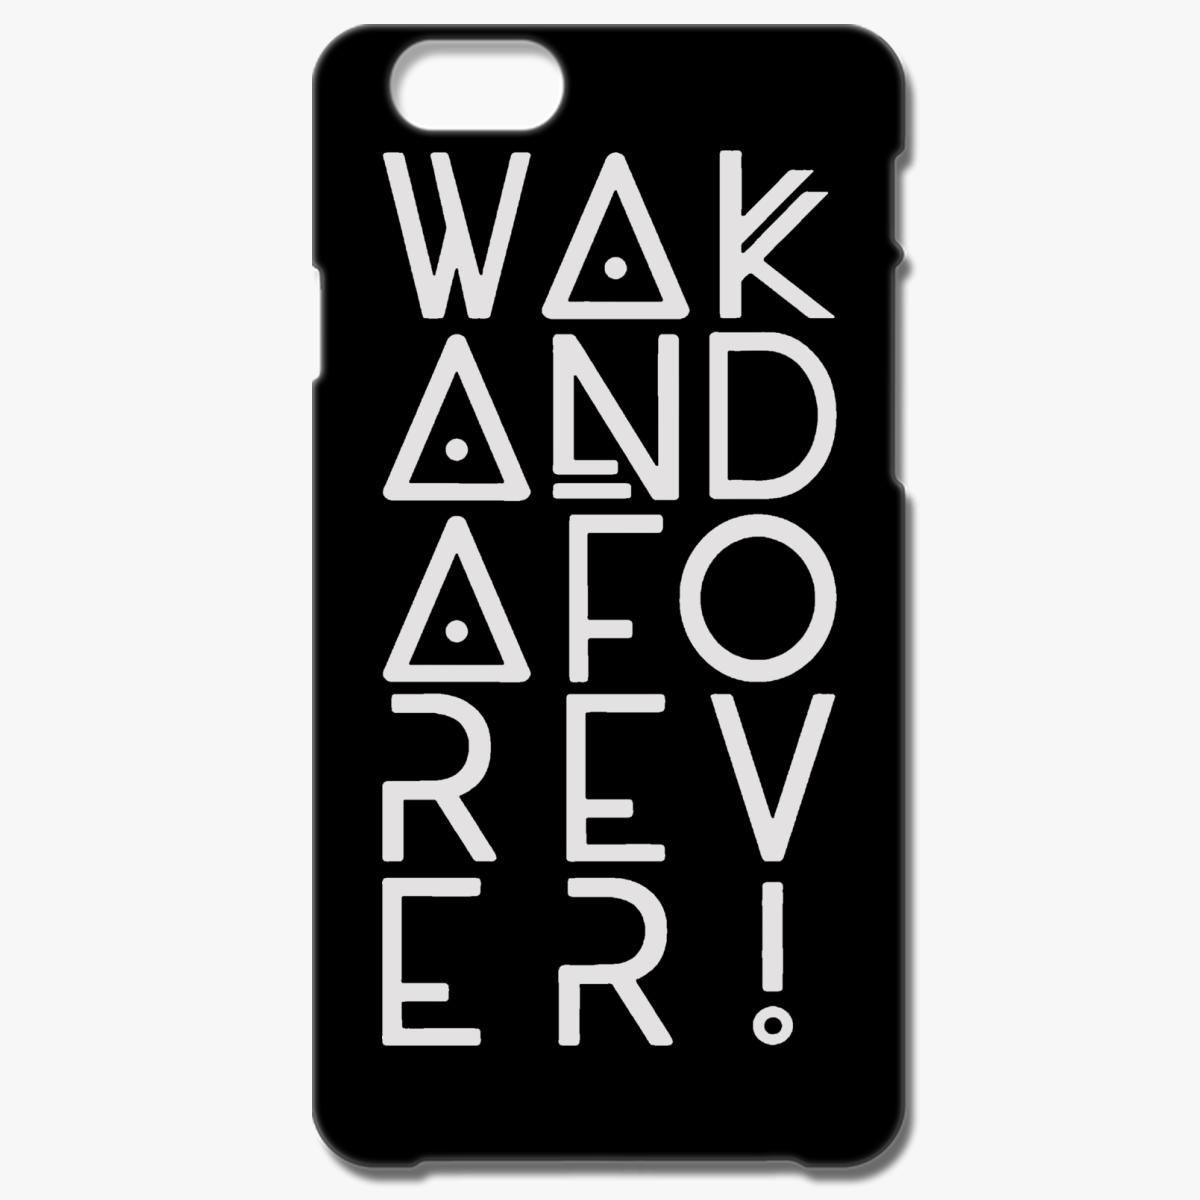 the best attitude 00f1b 5898a wakanda forever iPhone 6/6S Case - Customon